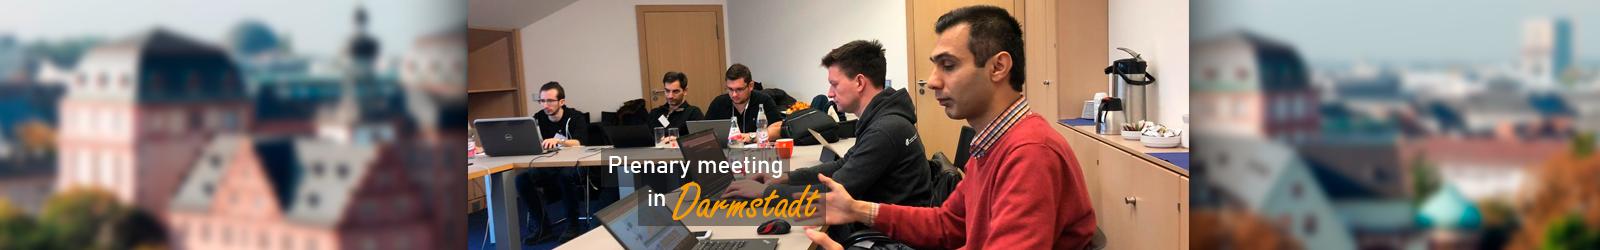 Plenary Meeting in Darmstadt